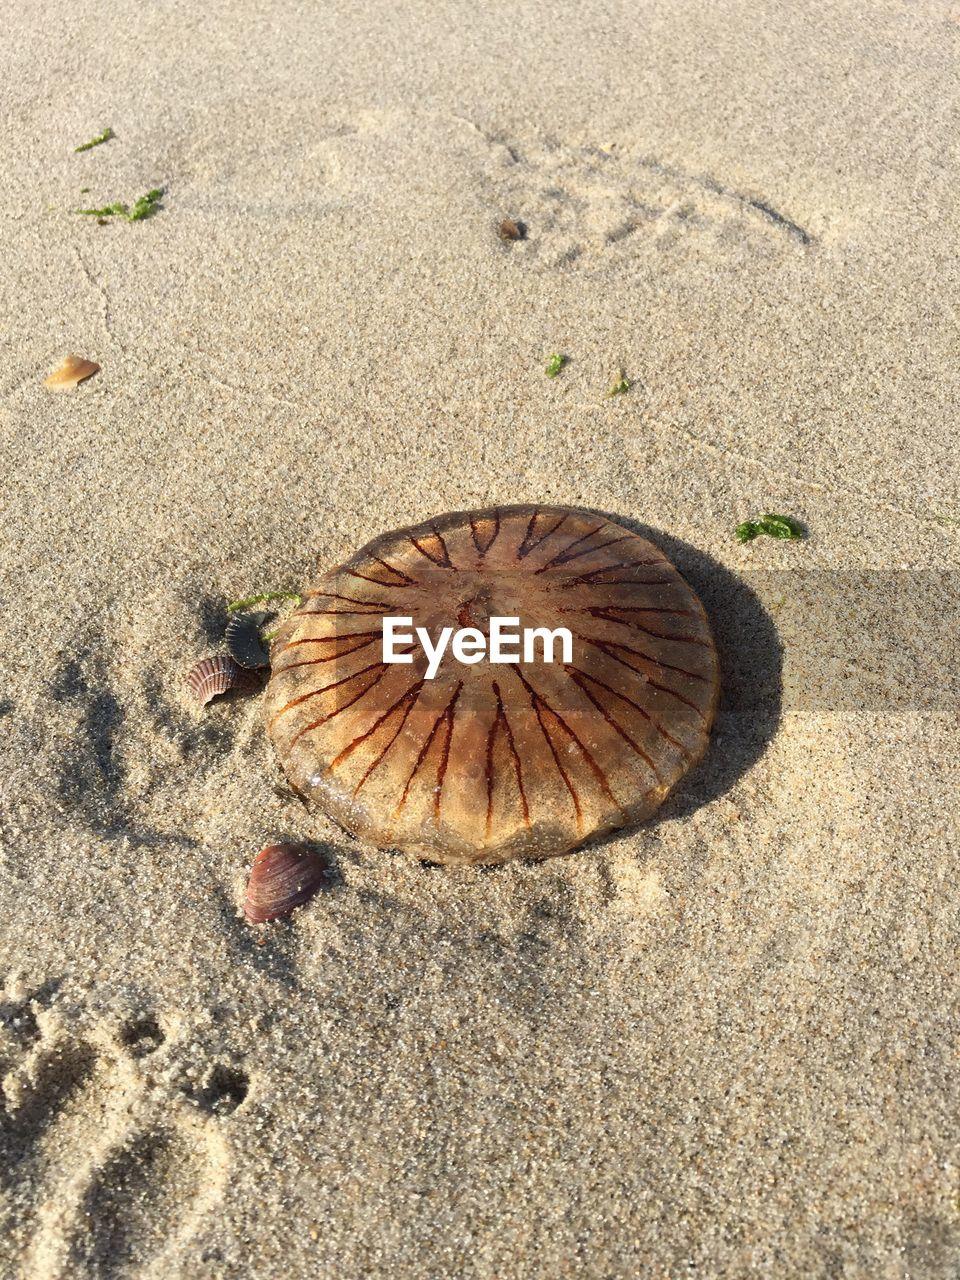 sand, beach, high angle view, one animal, day, nature, animal themes, seashell, no people, outdoors, sea life, close-up